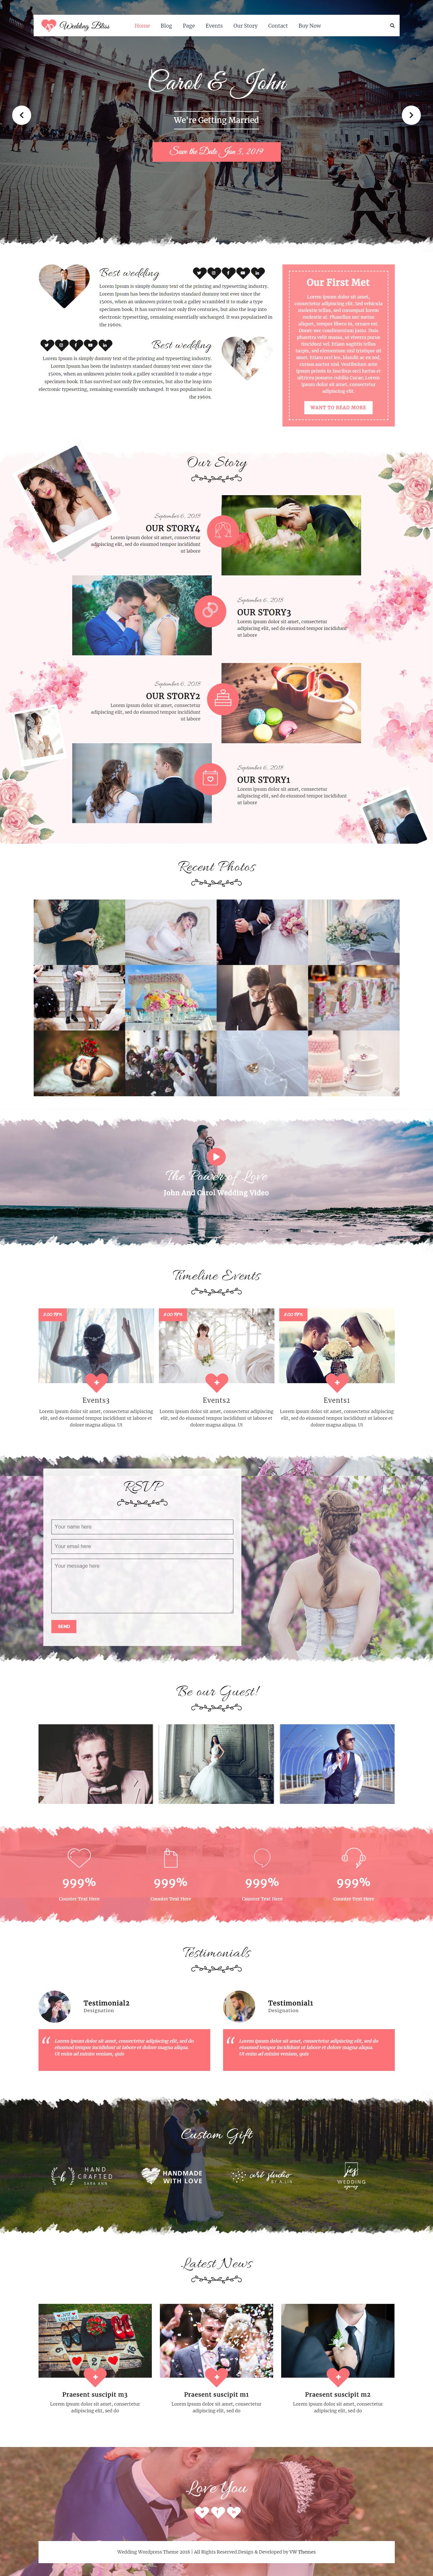 vw wedding best free wedding wordpress theme - 10+ Best Free Wedding WordPress Themes